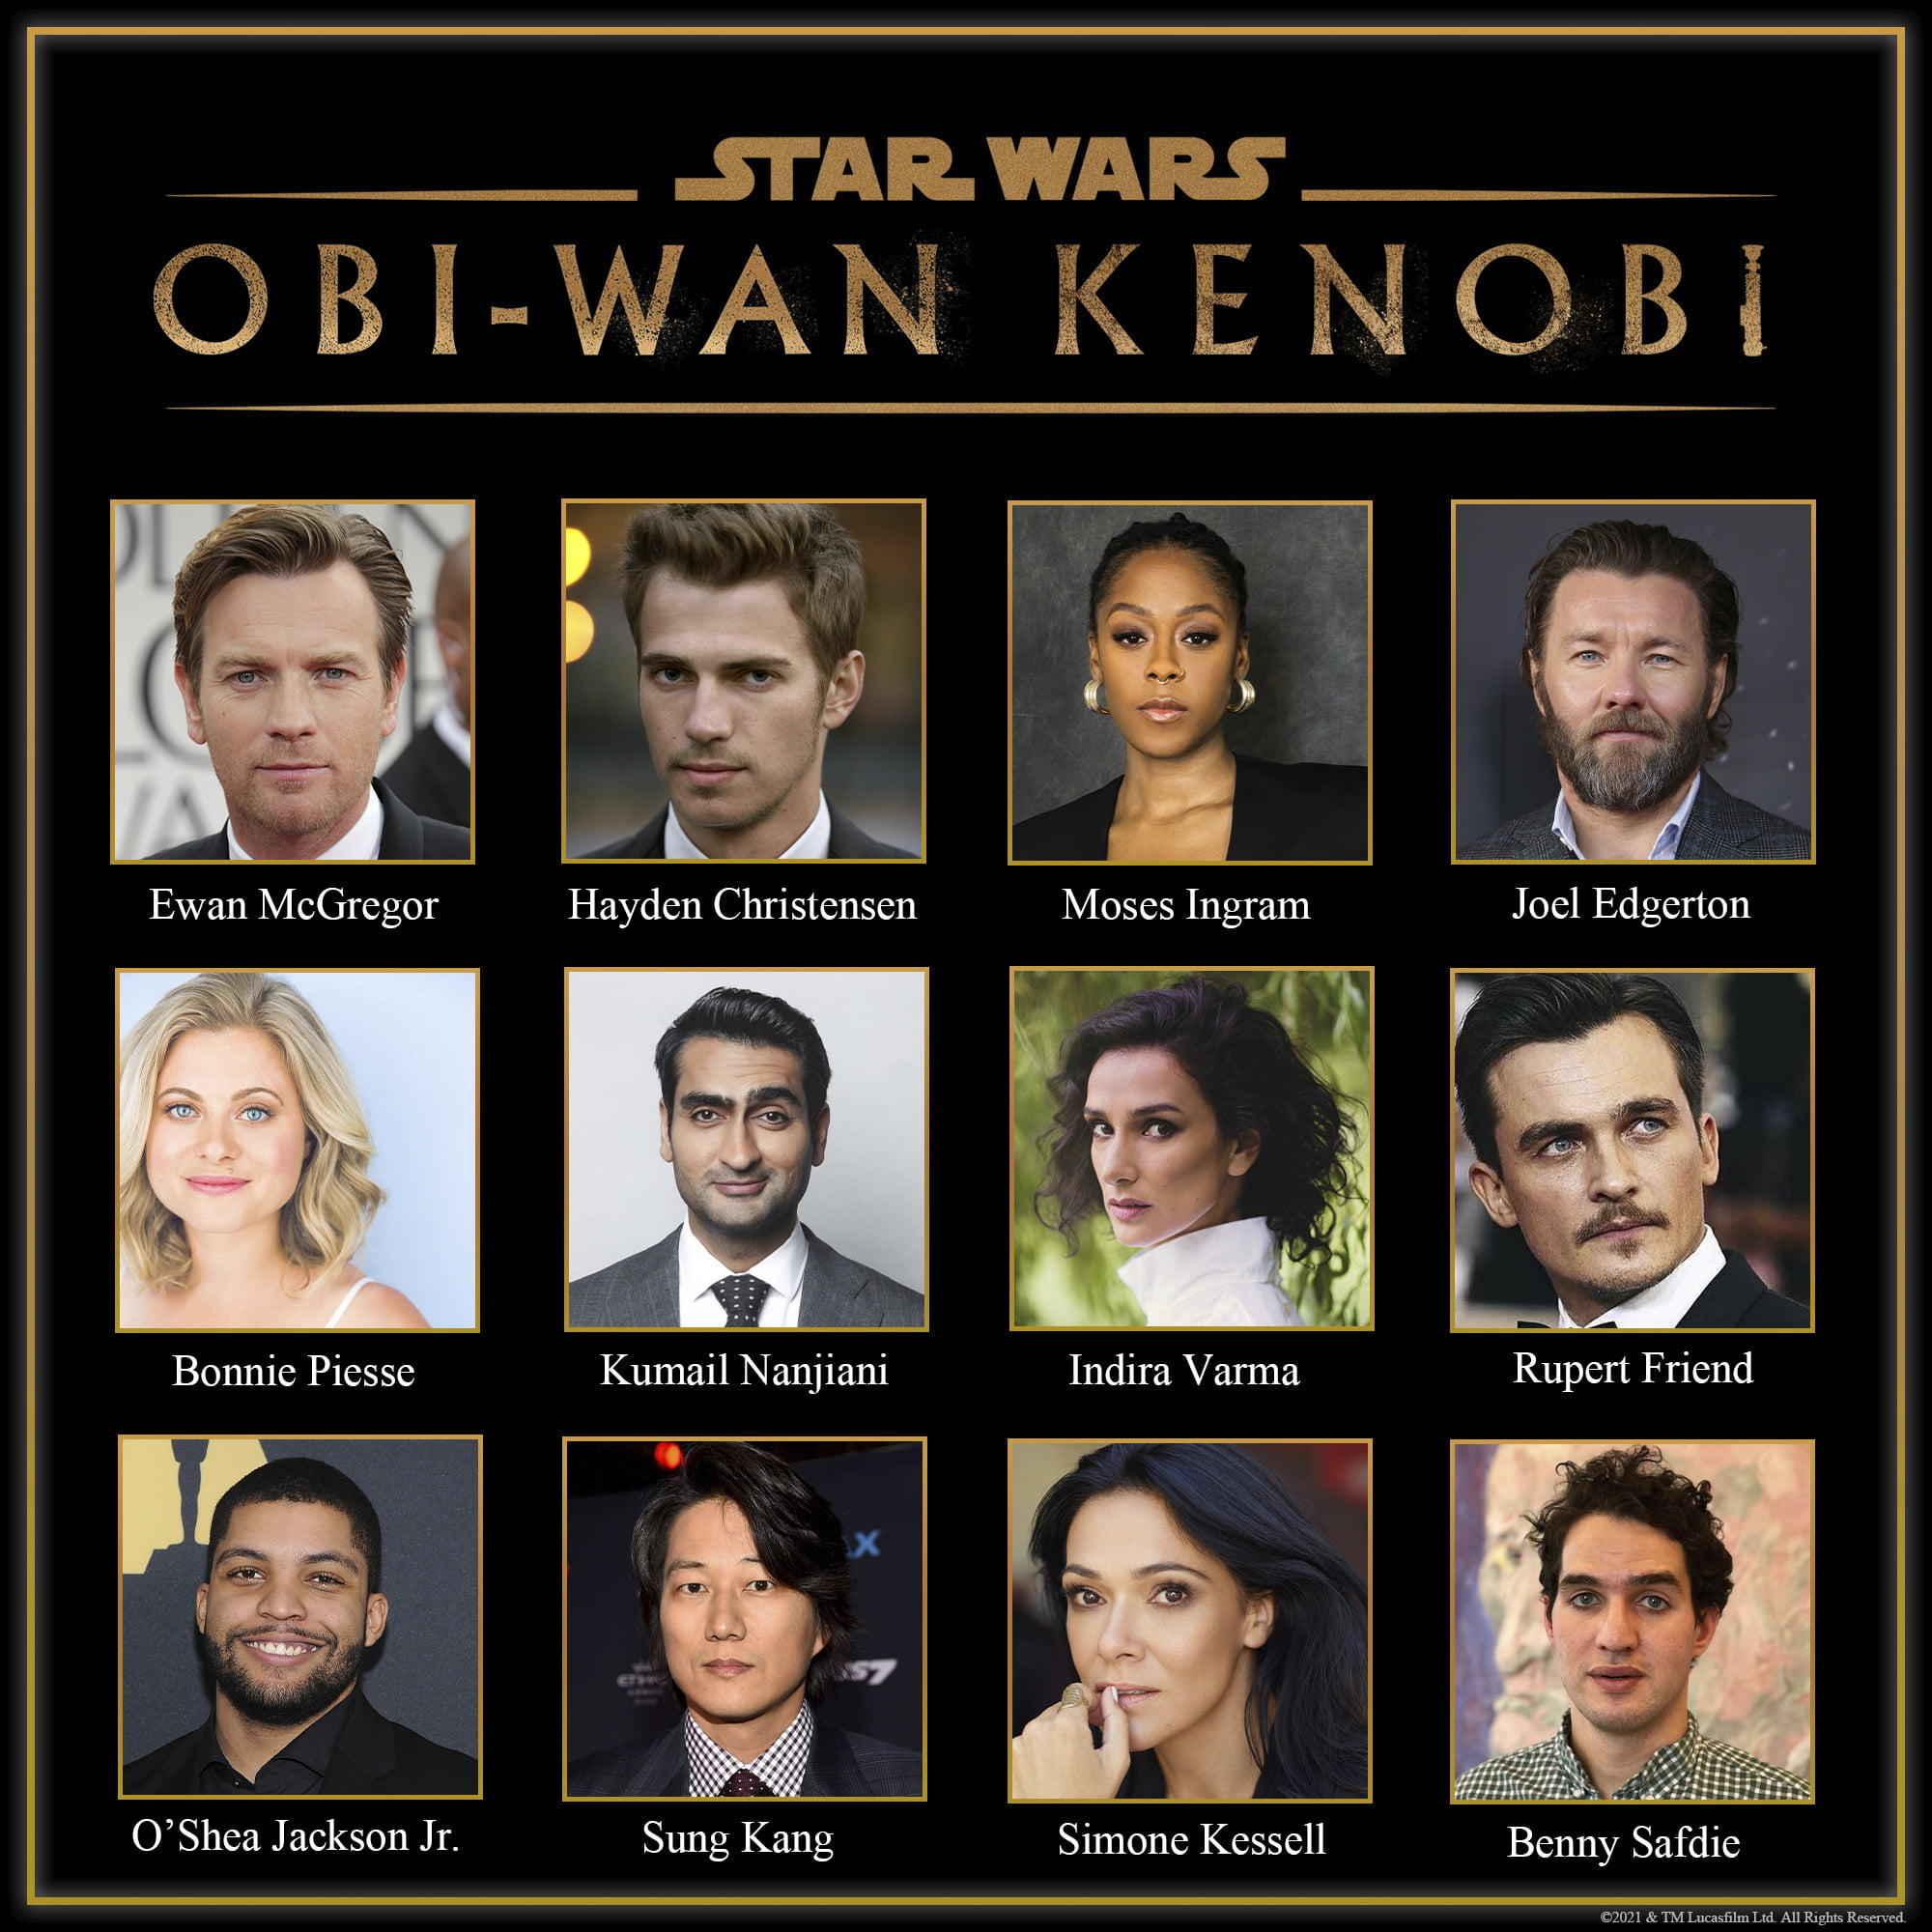 Obi-Wan Kenobi To Begin Production